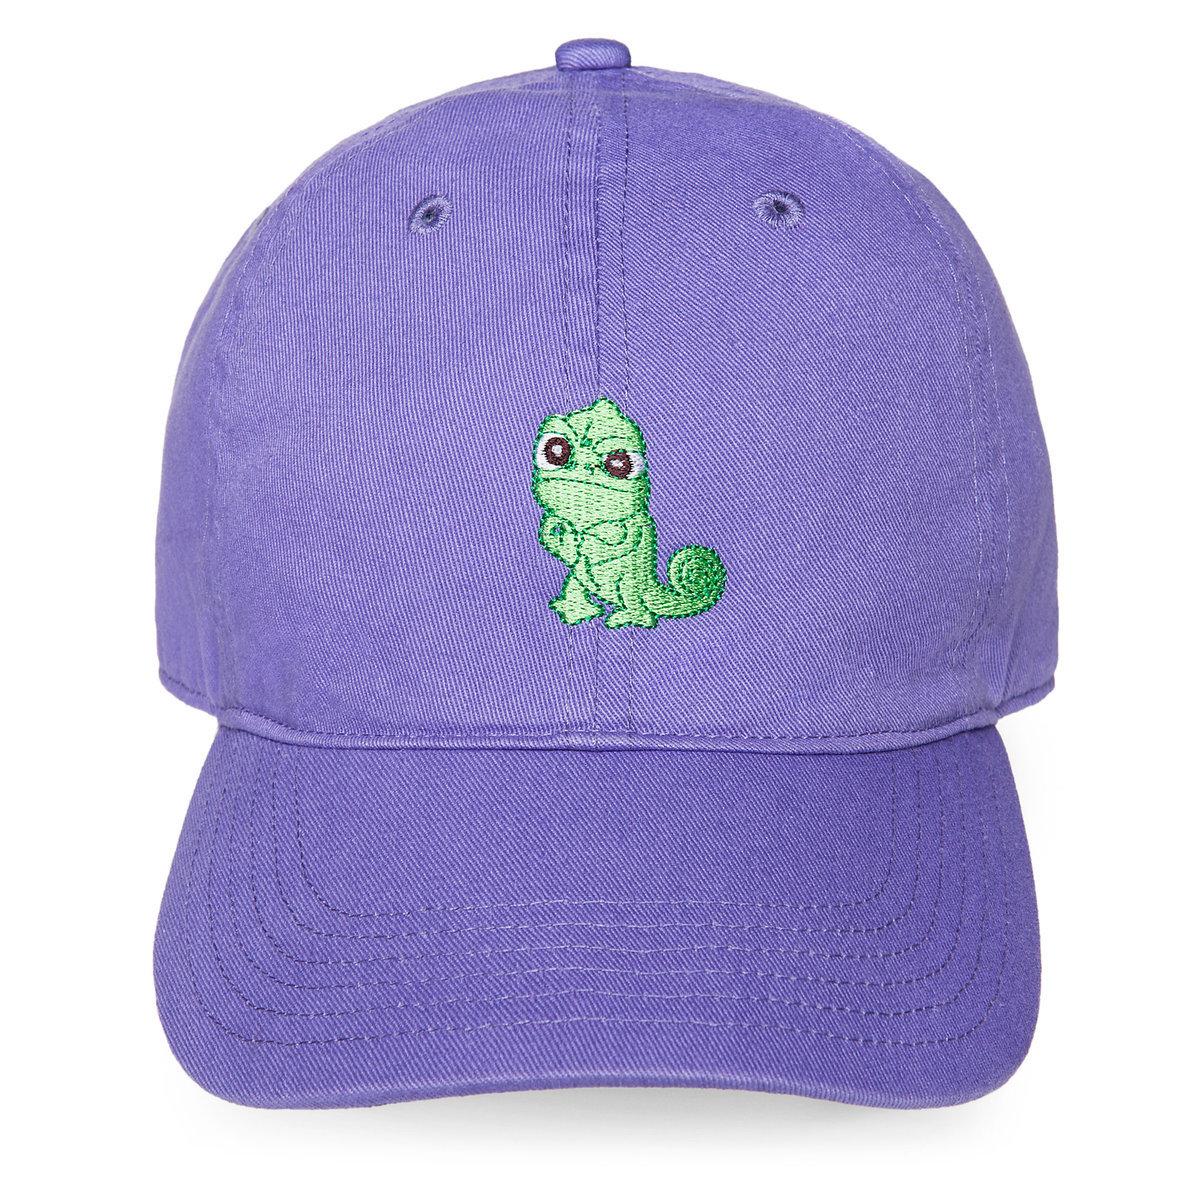 Disney Baseball Cap - Tangled Pascal - Purple 8ef26ecb832